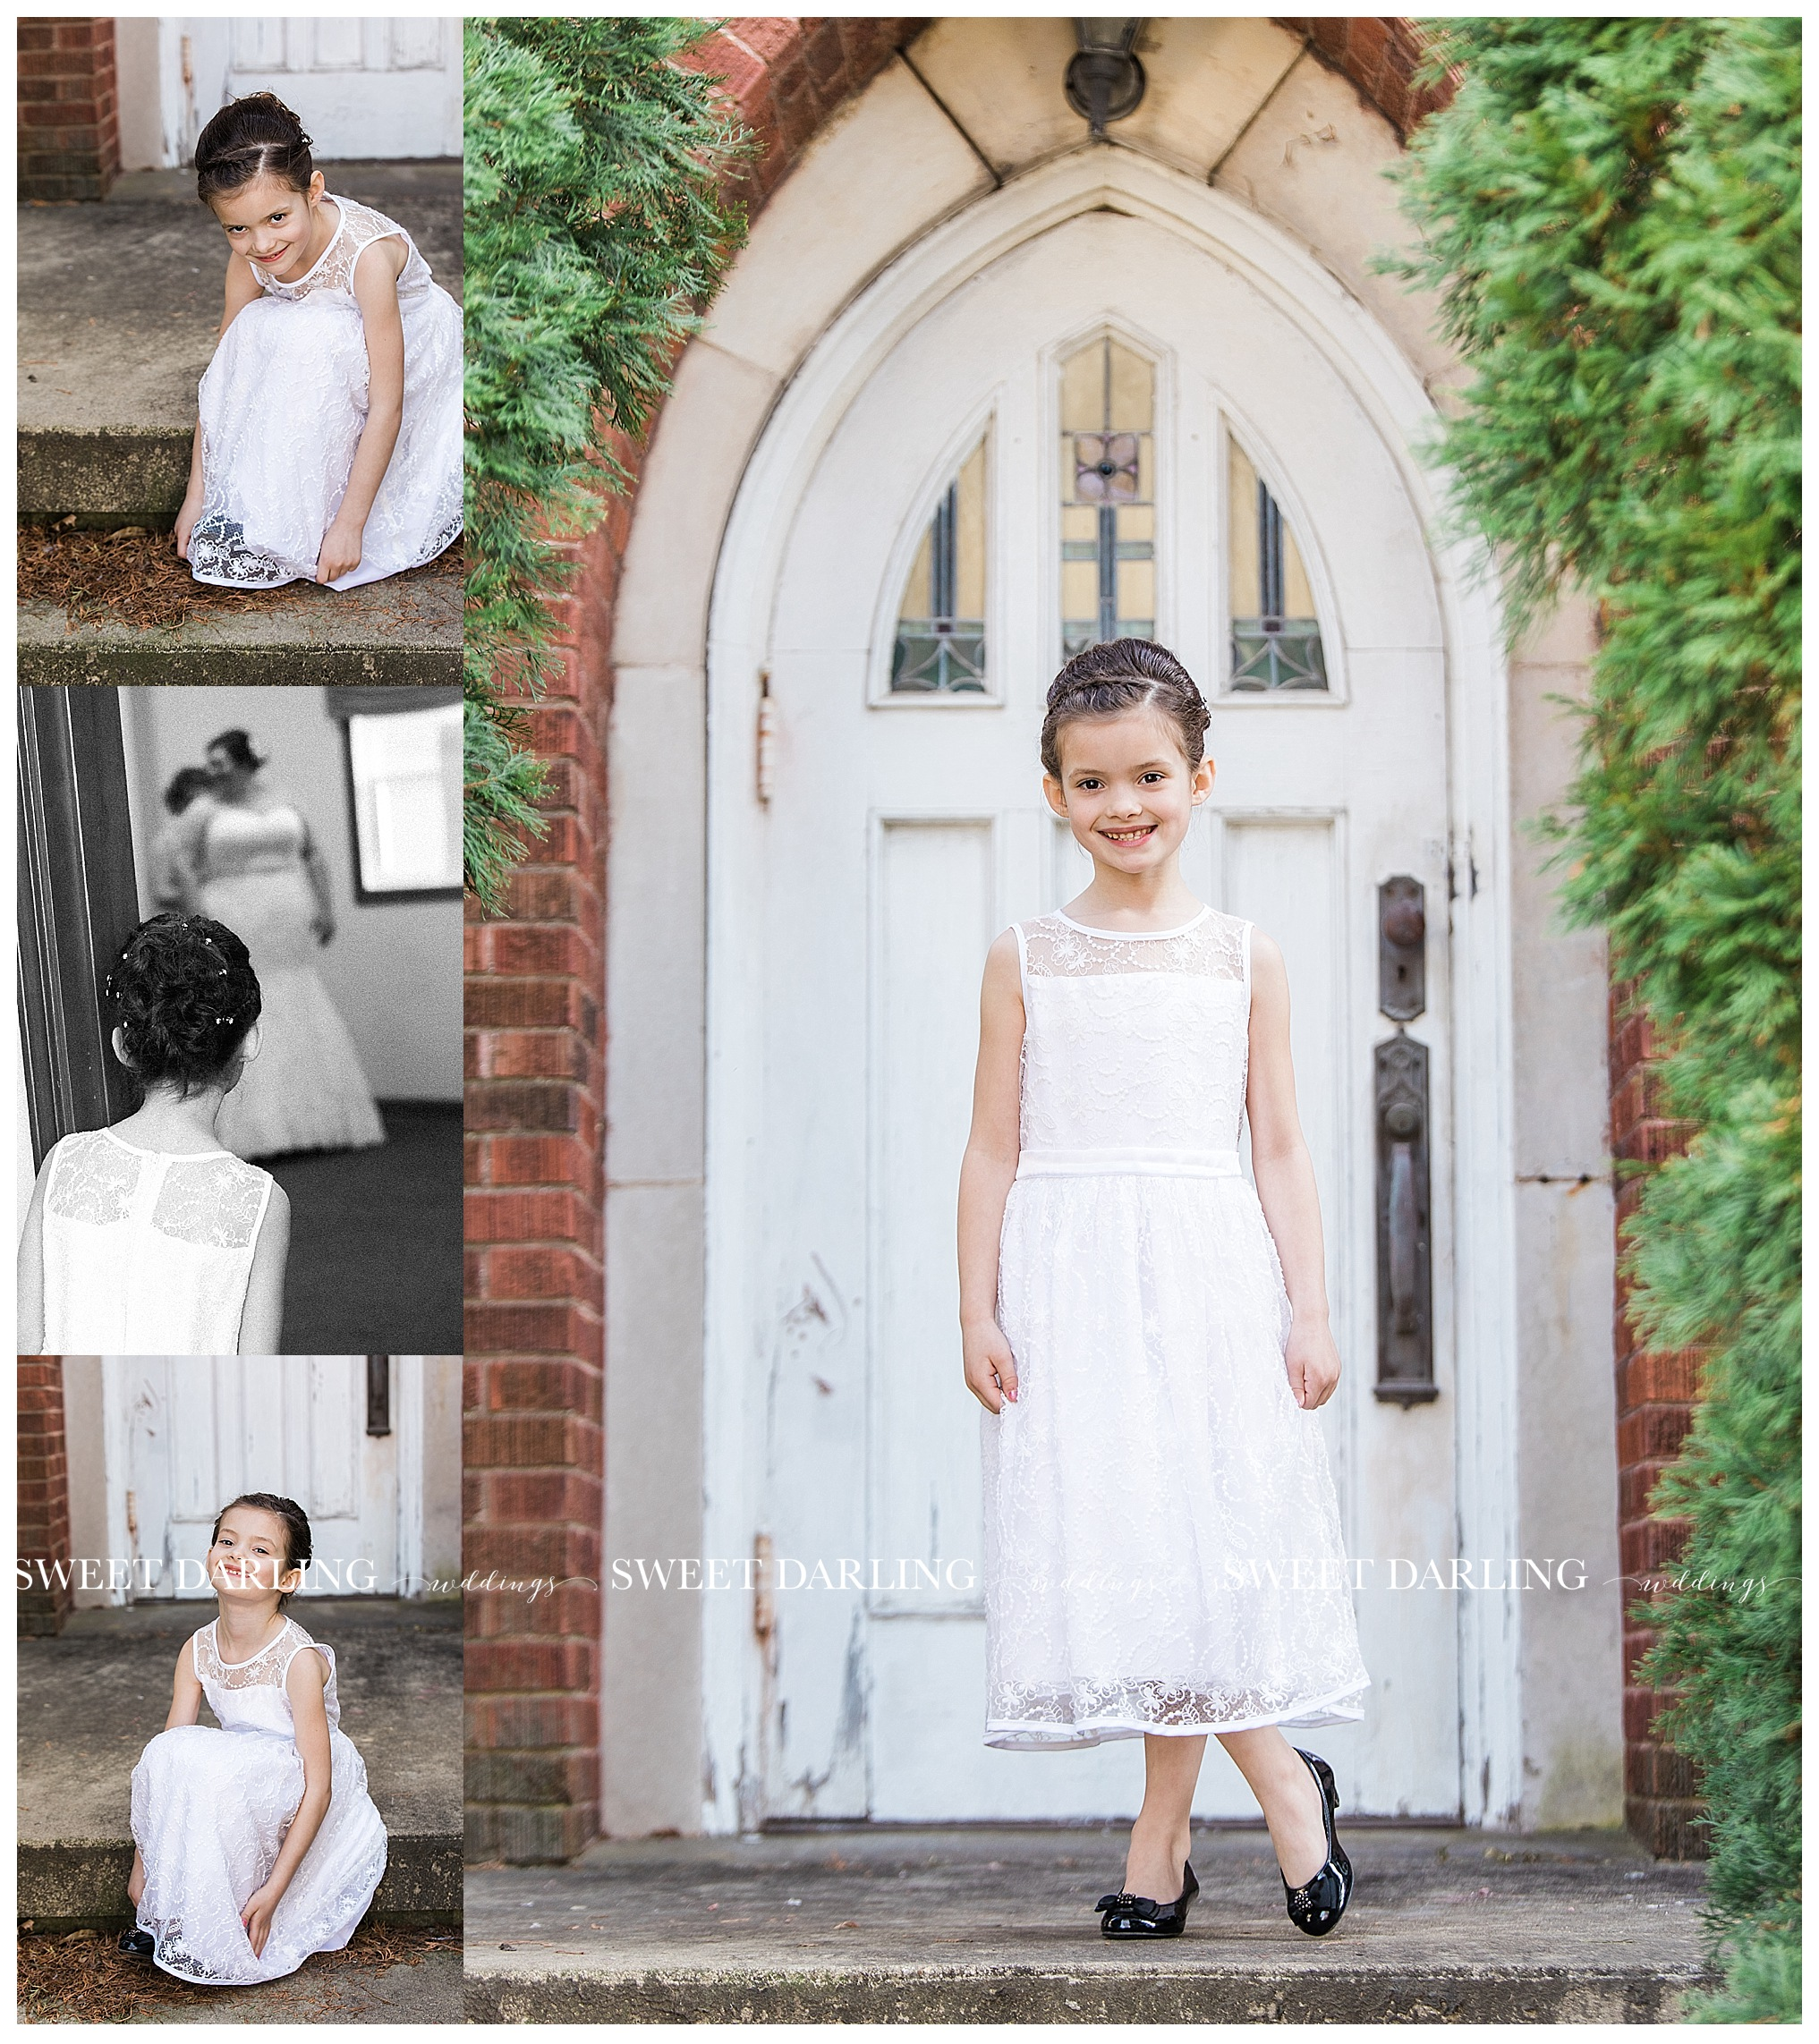 arcoloa-illinois-coles-county-wedding-photography-sweet-darling-weddings-photographer_0943.jpg